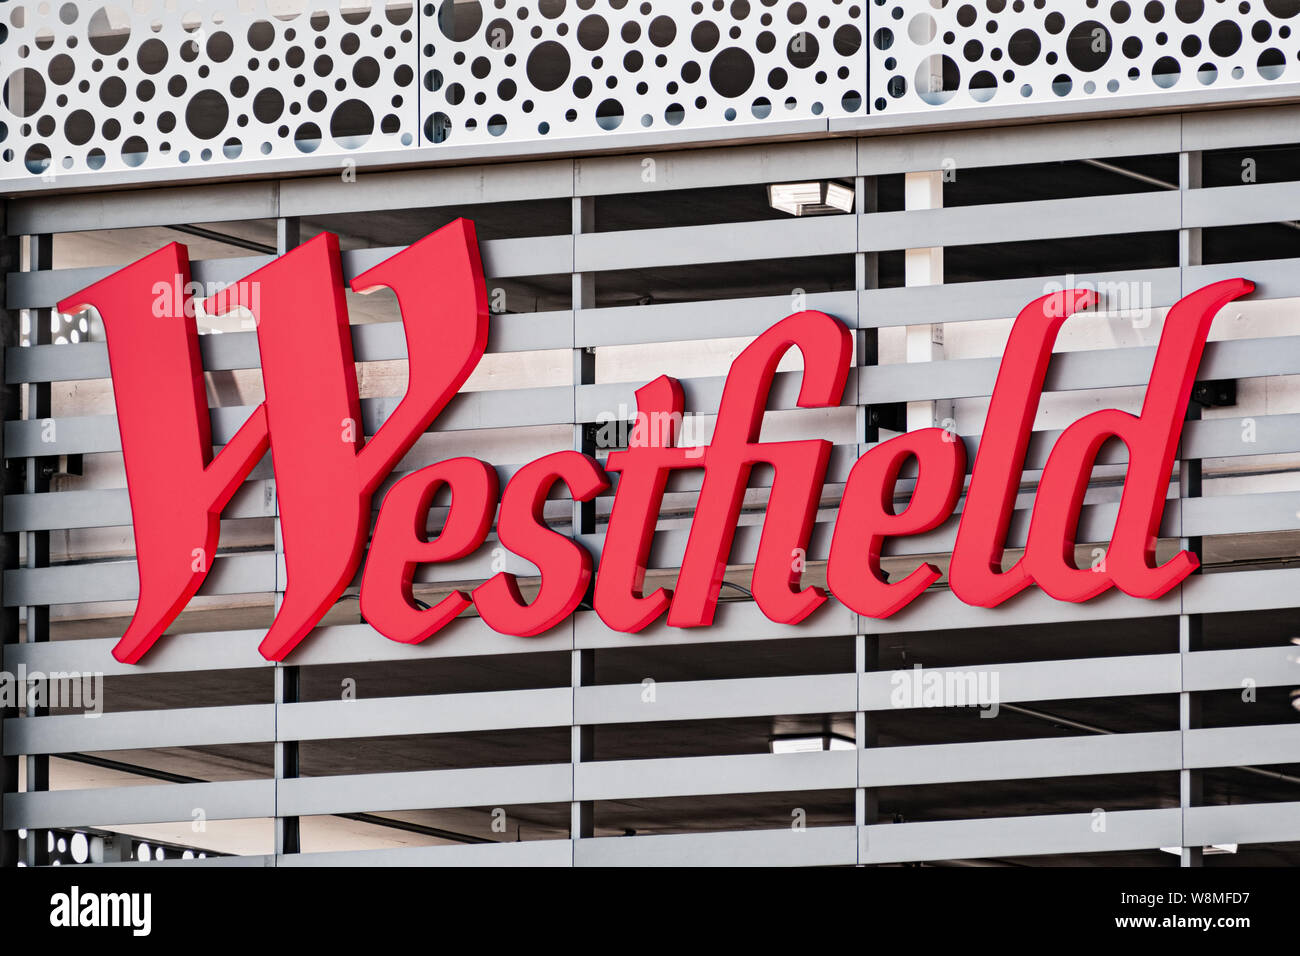 August 9, 2019 San Jose / CA / USA - Close up of Westfield Valley Fair Mall logo; San Francisco bay area Stock Photo